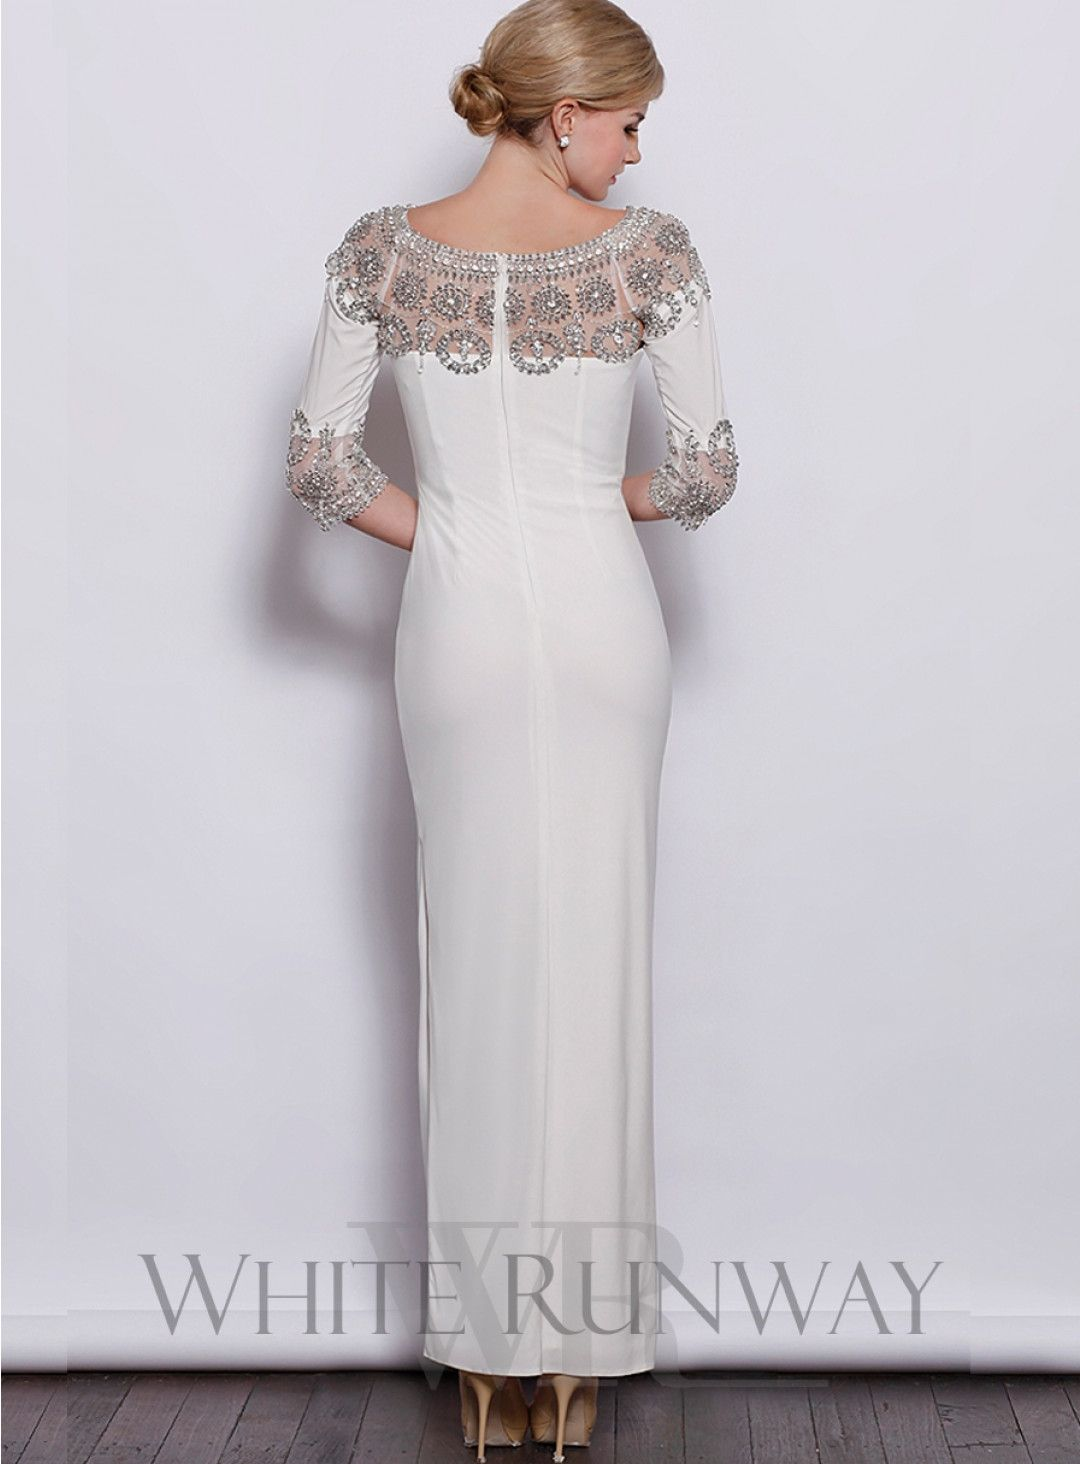 Vienna dress the vienna dress makes a perfect engagement or wedding